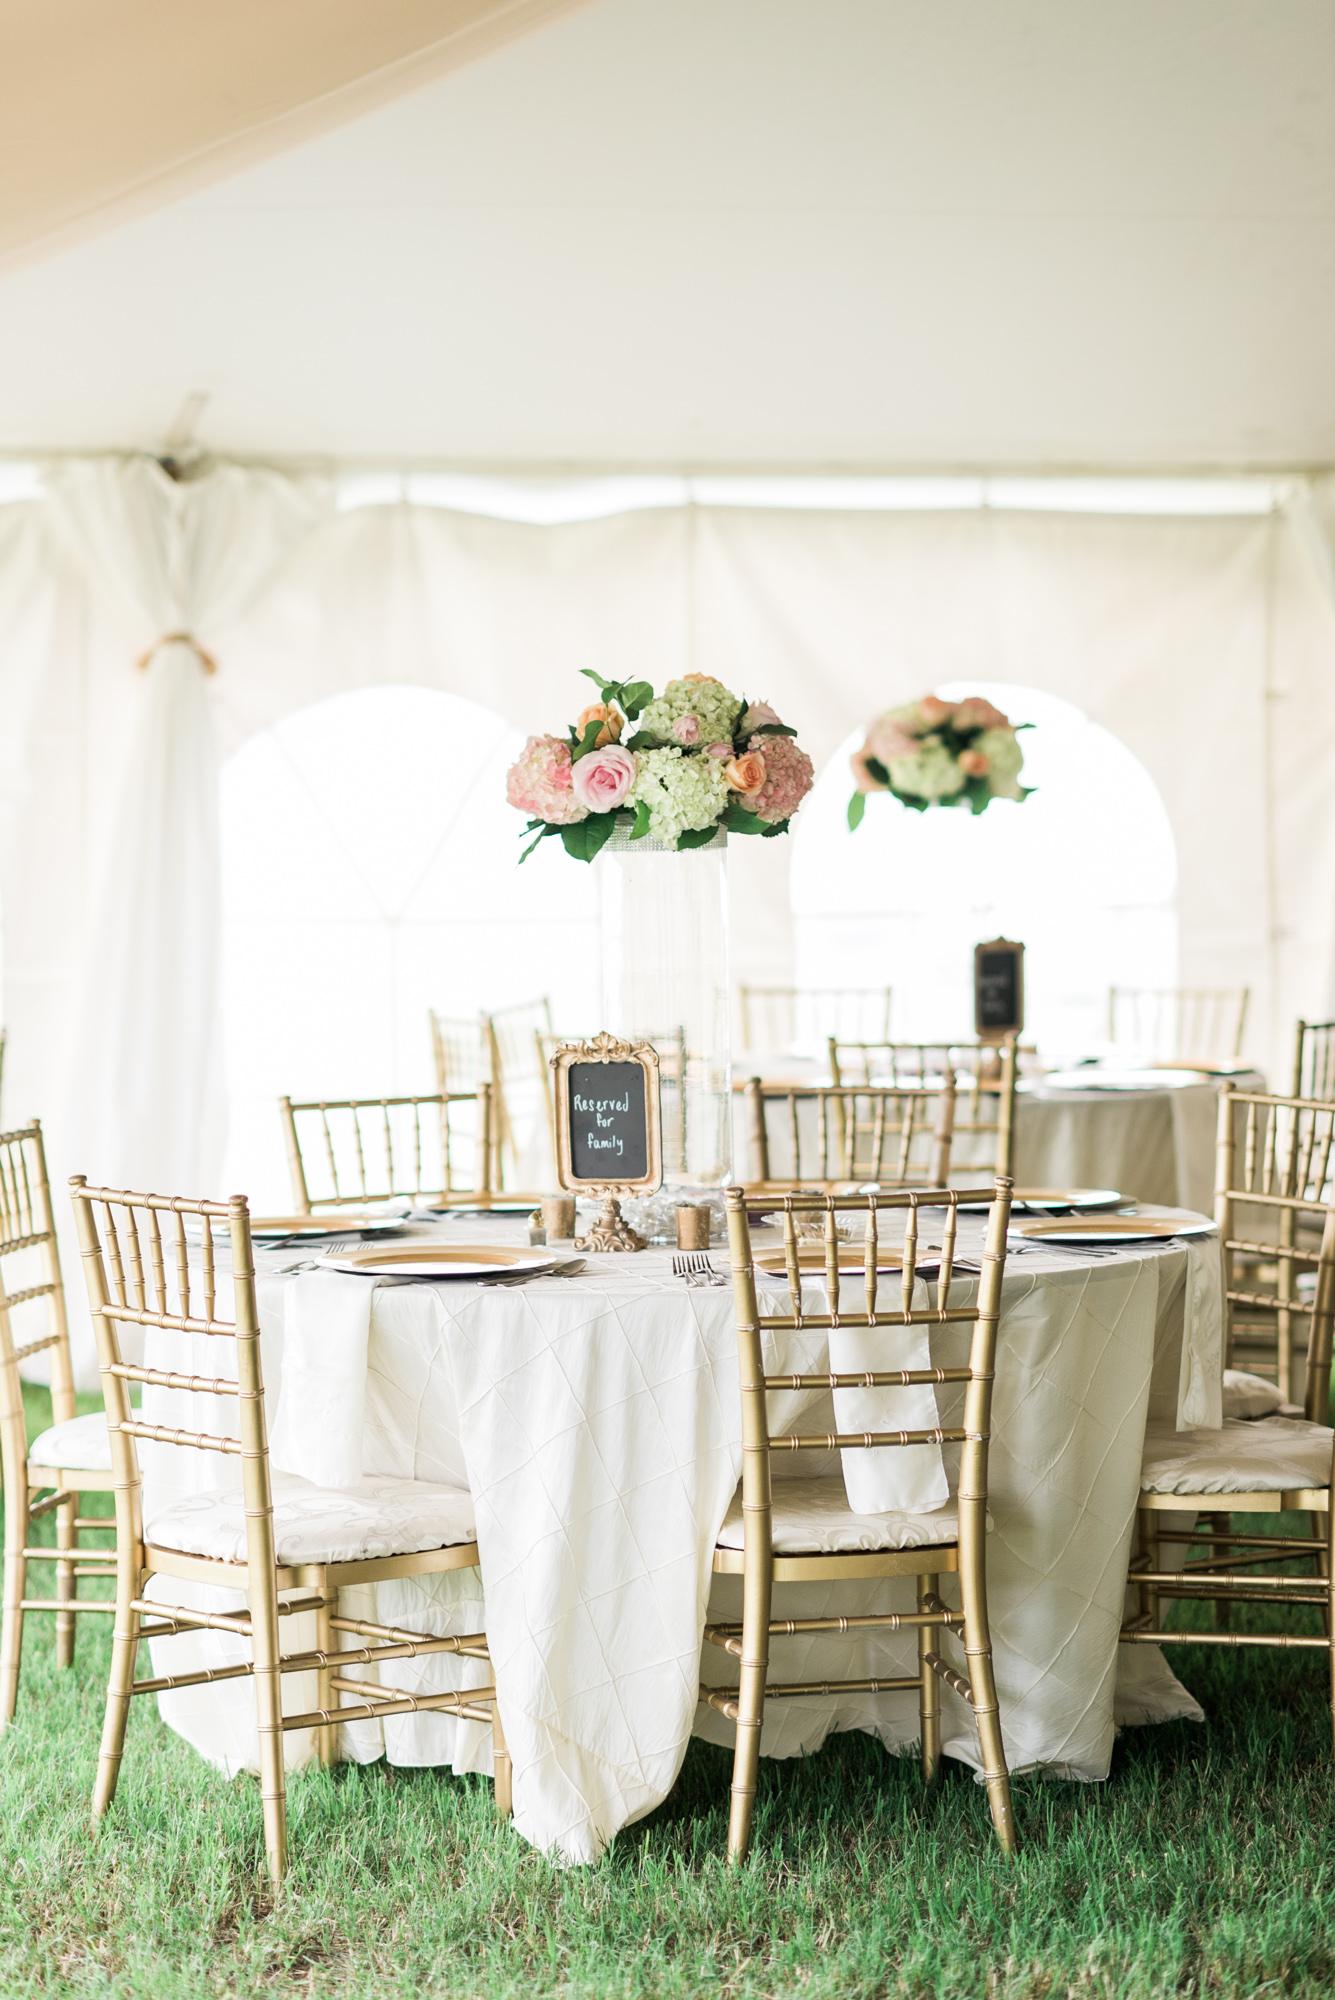 An Elegant Blush Backyard Wedding | Every Last Detail